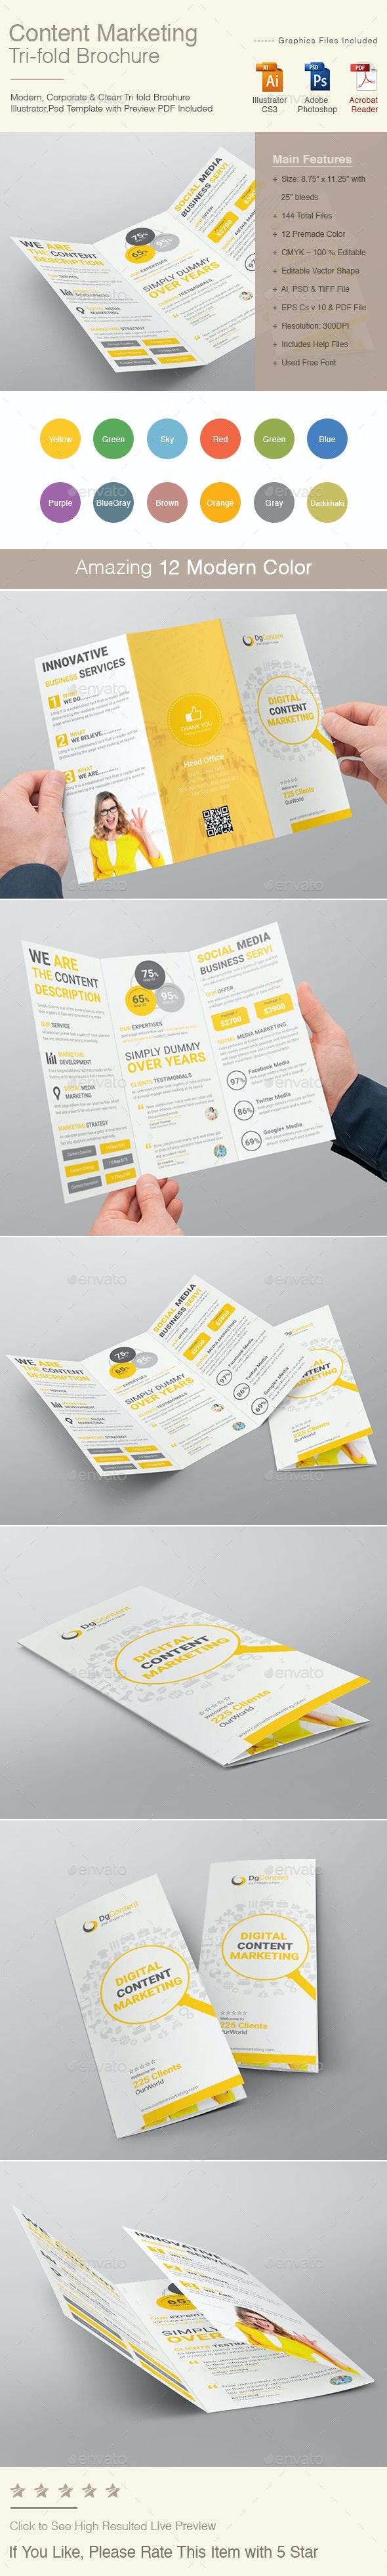 Content Marketing Tri-fold Brochure - Corporate Brochures